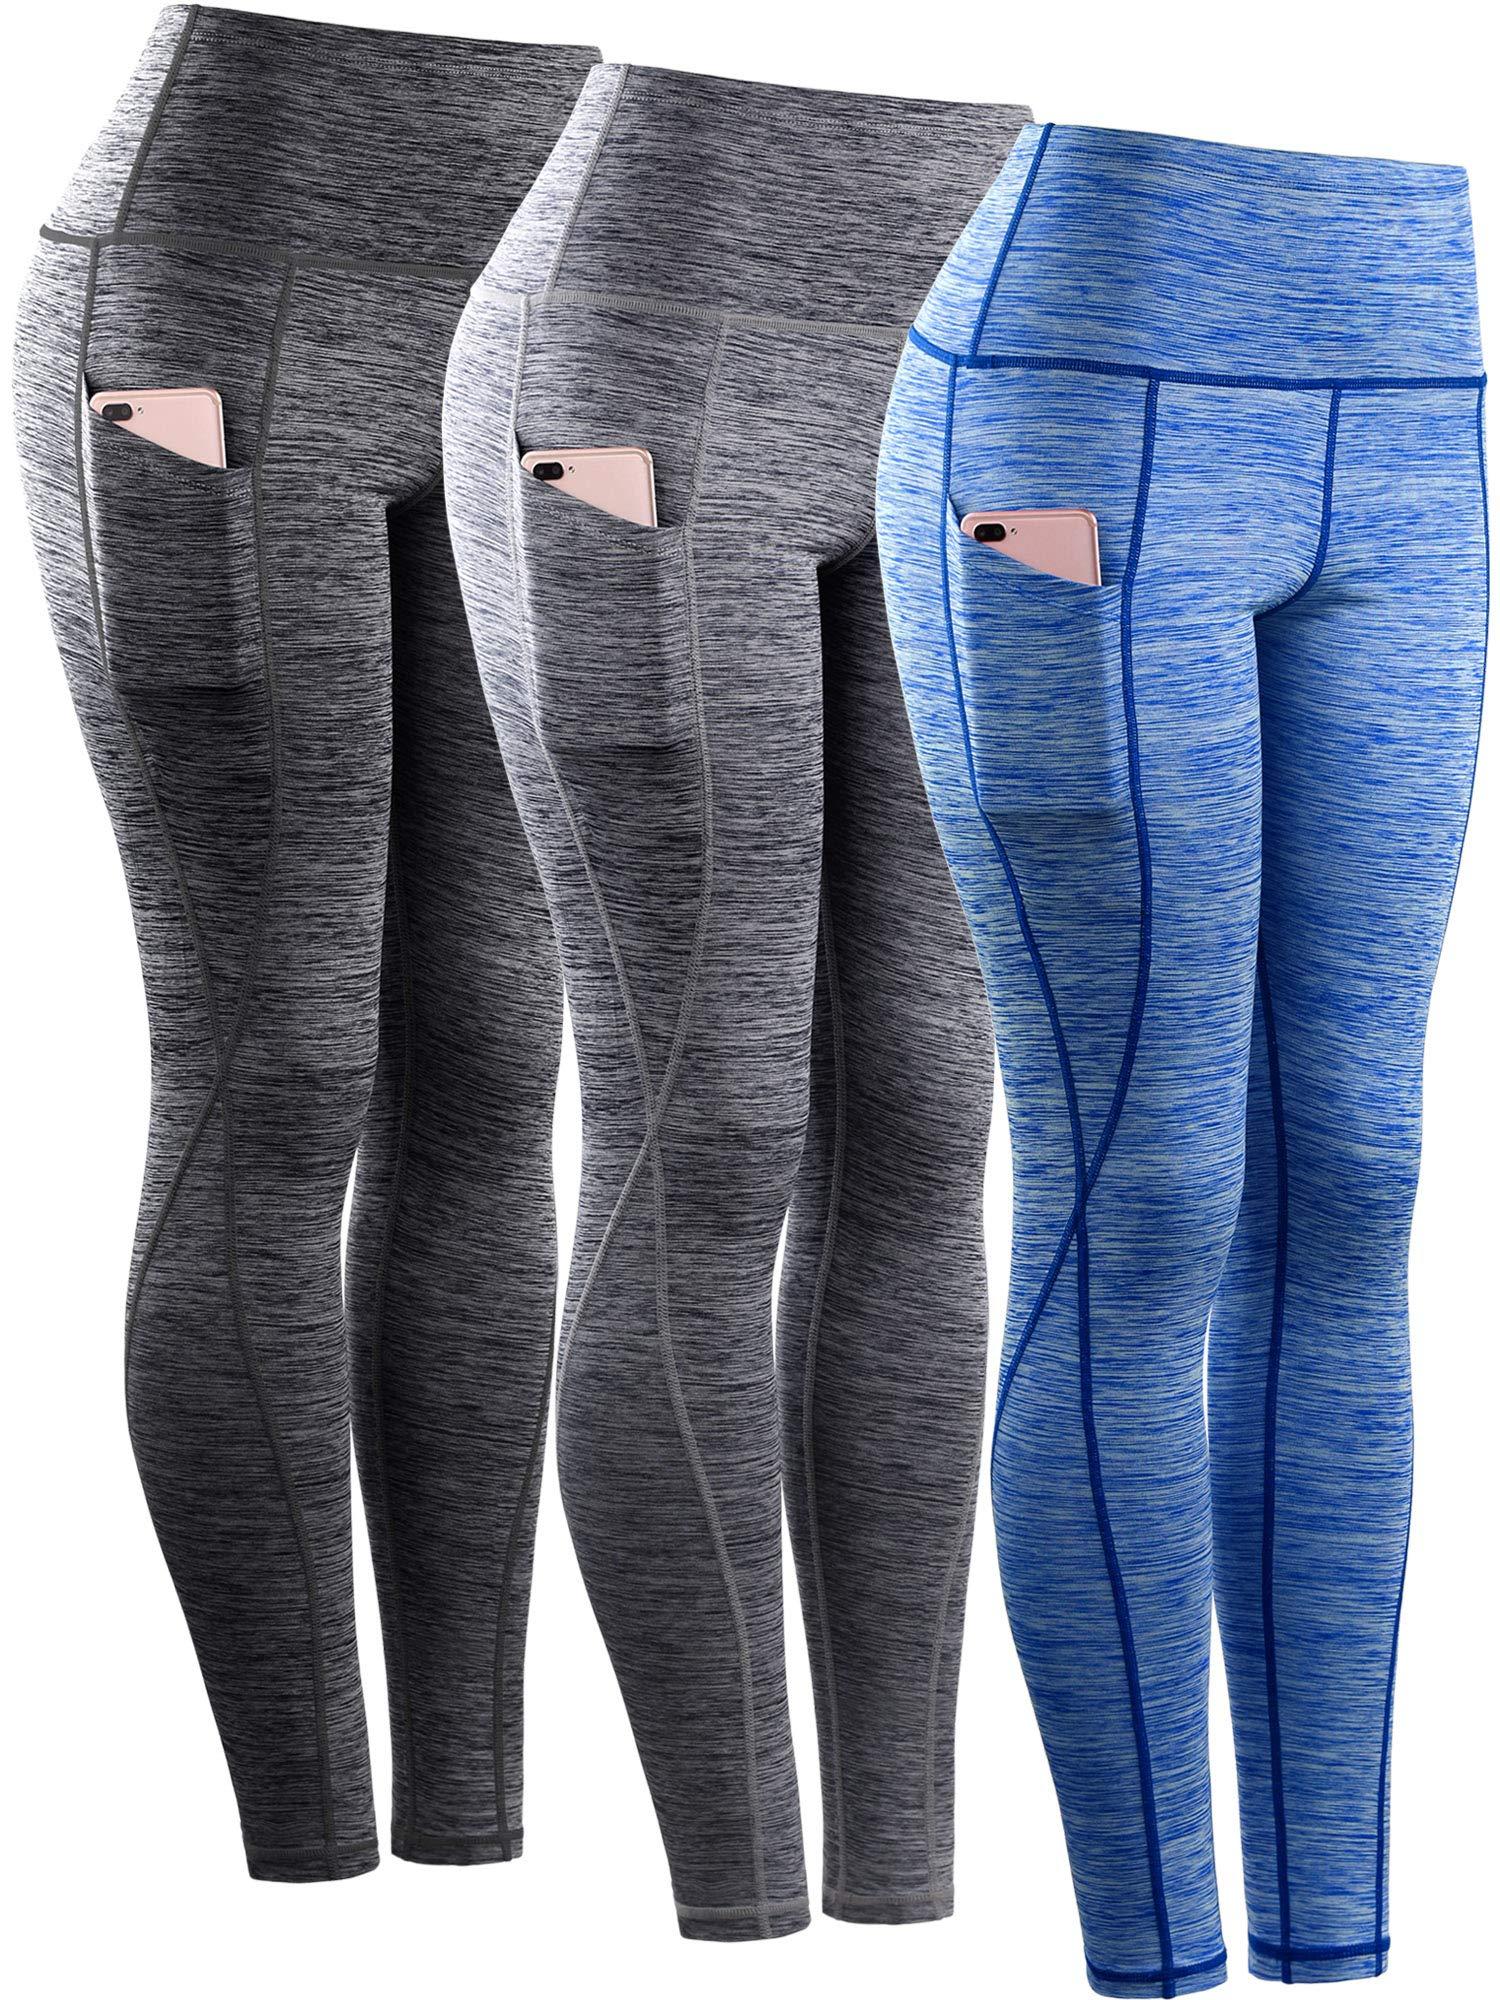 Neleus Tummy Control High Waist Workout Running Leggings for Women,9033,Yoga Pant 3 Pack,Black,Grey,Blue,S,EU M